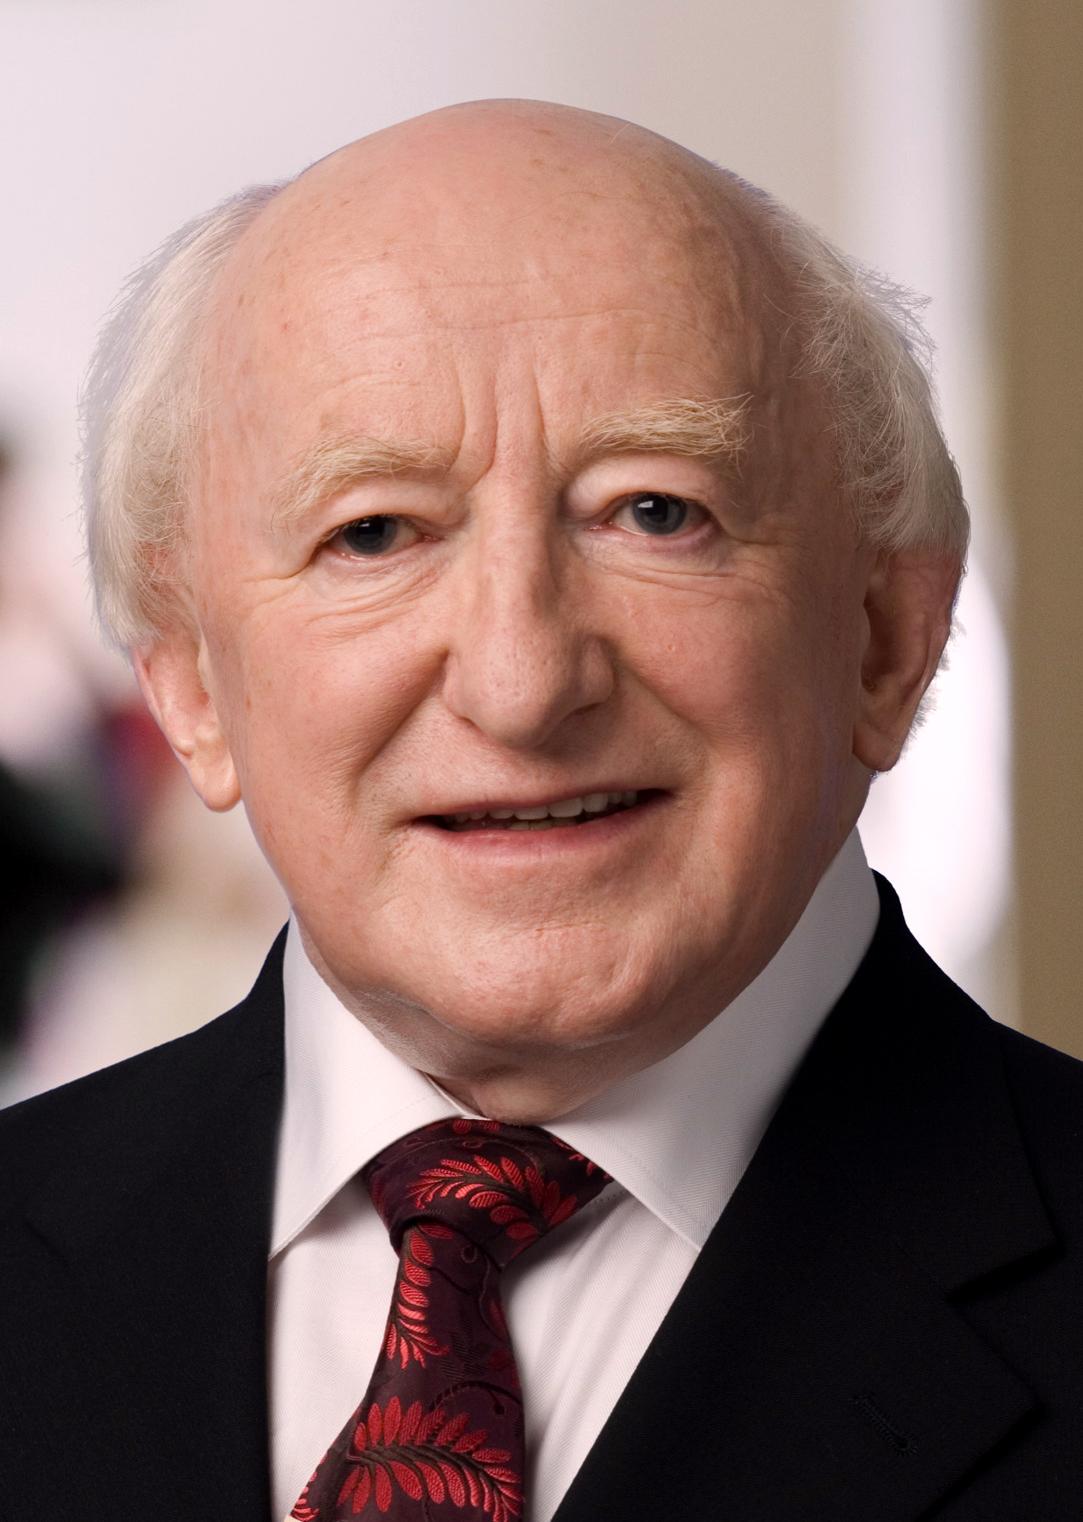 Depiction of Michael D. Higgins